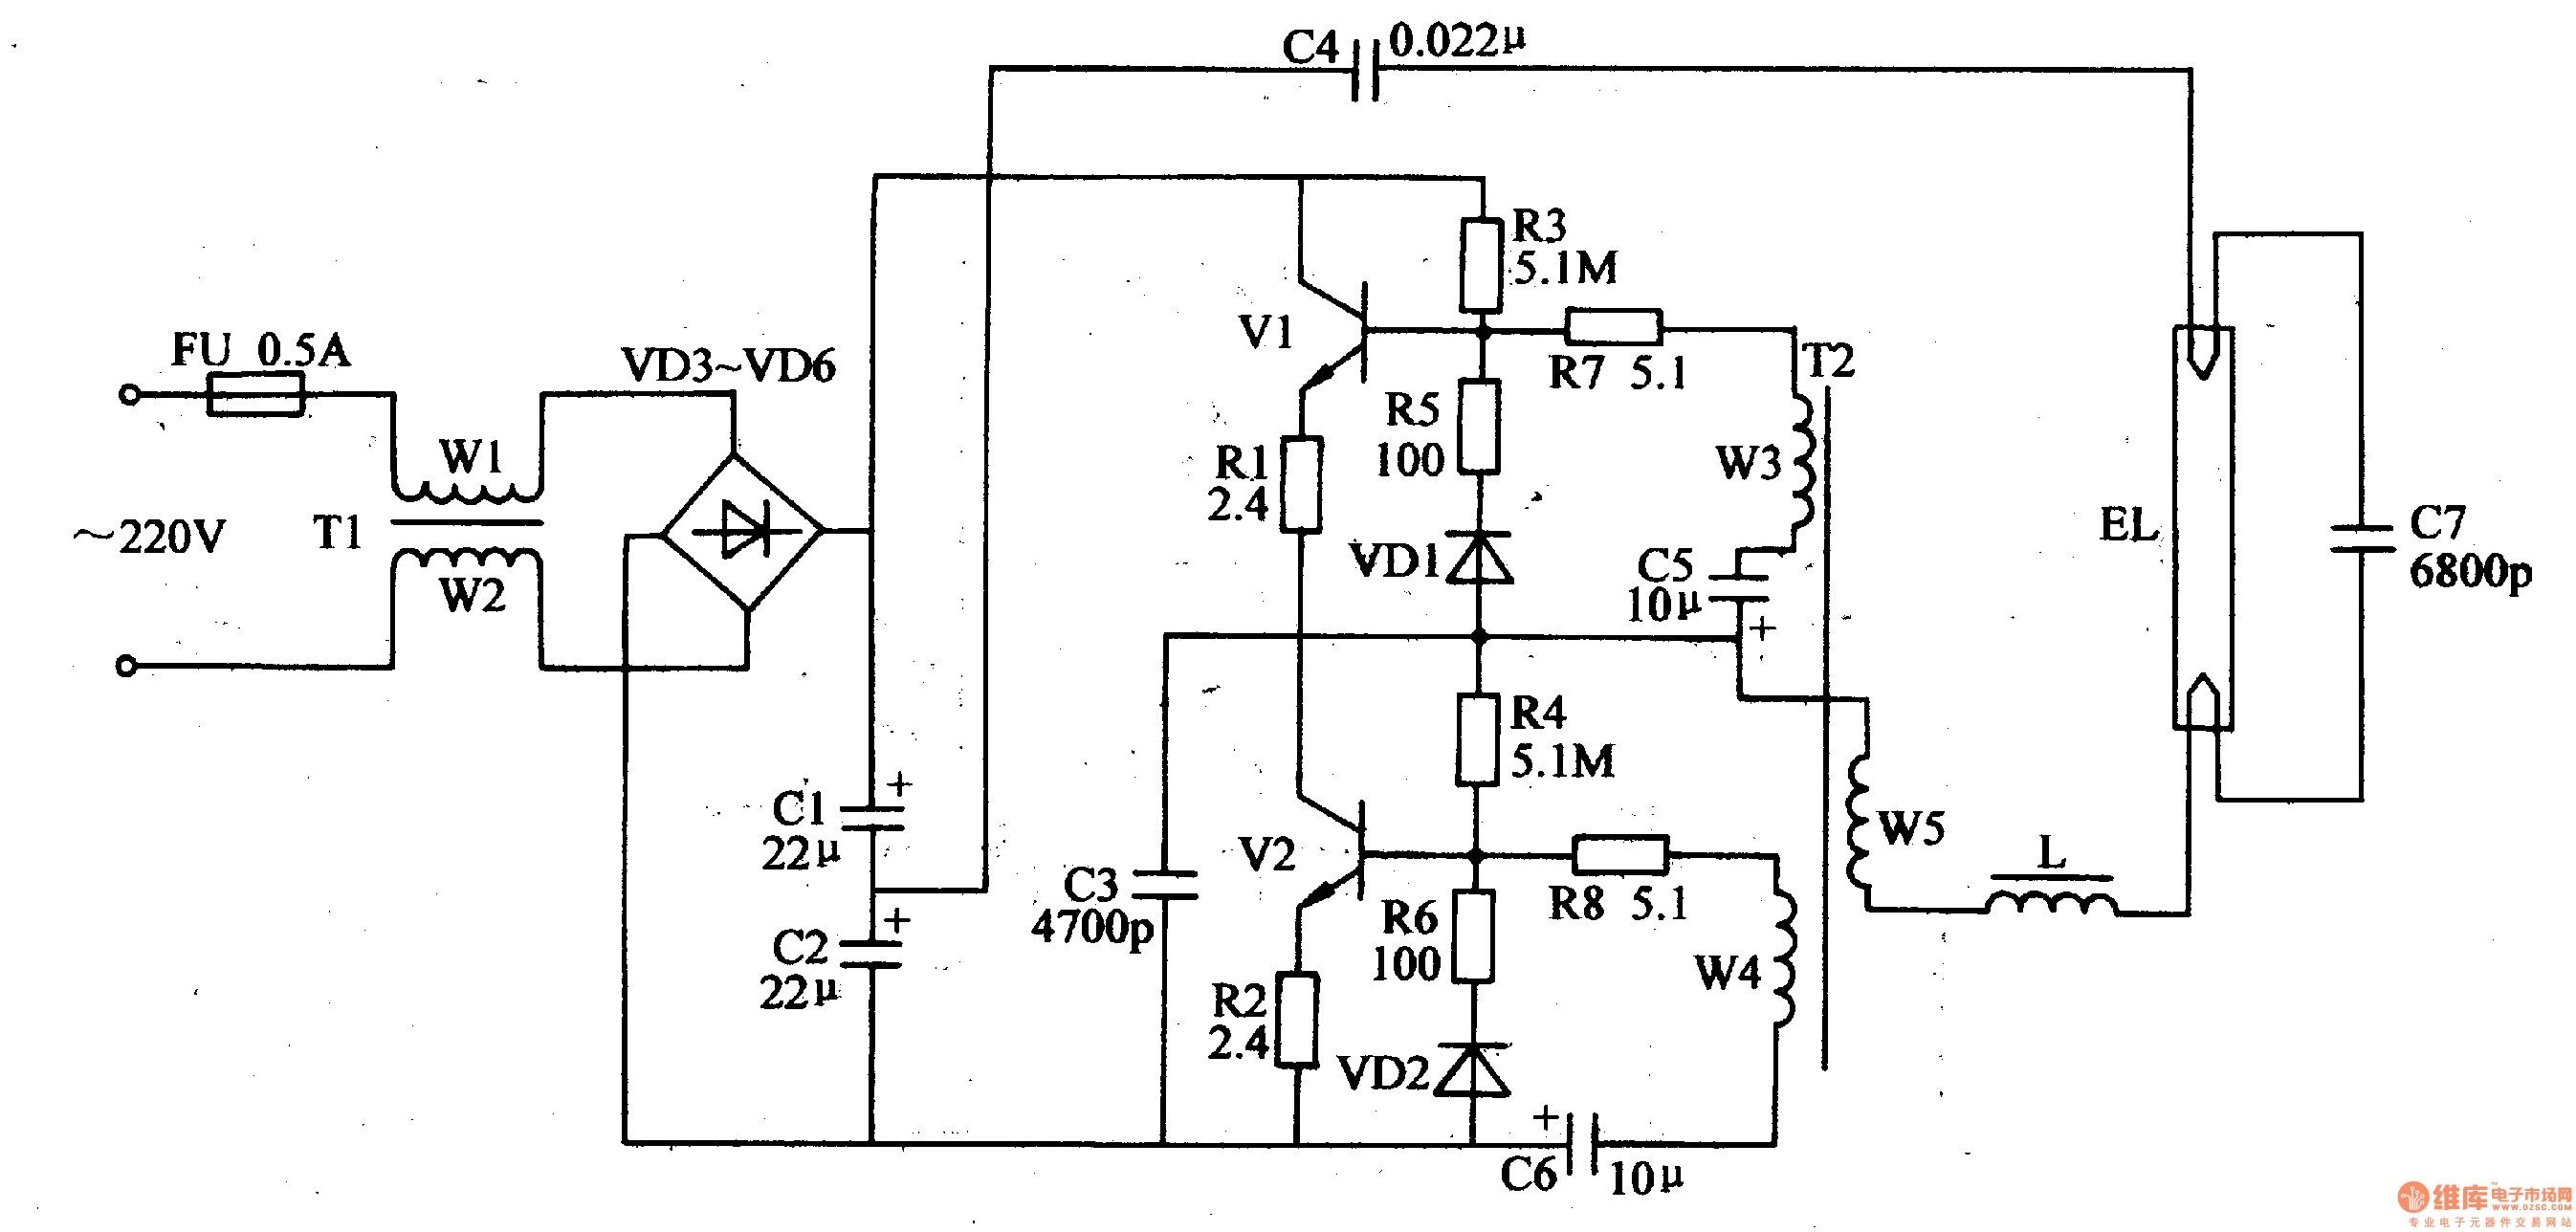 Circuit Diagram Electronic Ballast Zen 741 pin diagram house lighting circuit diagram